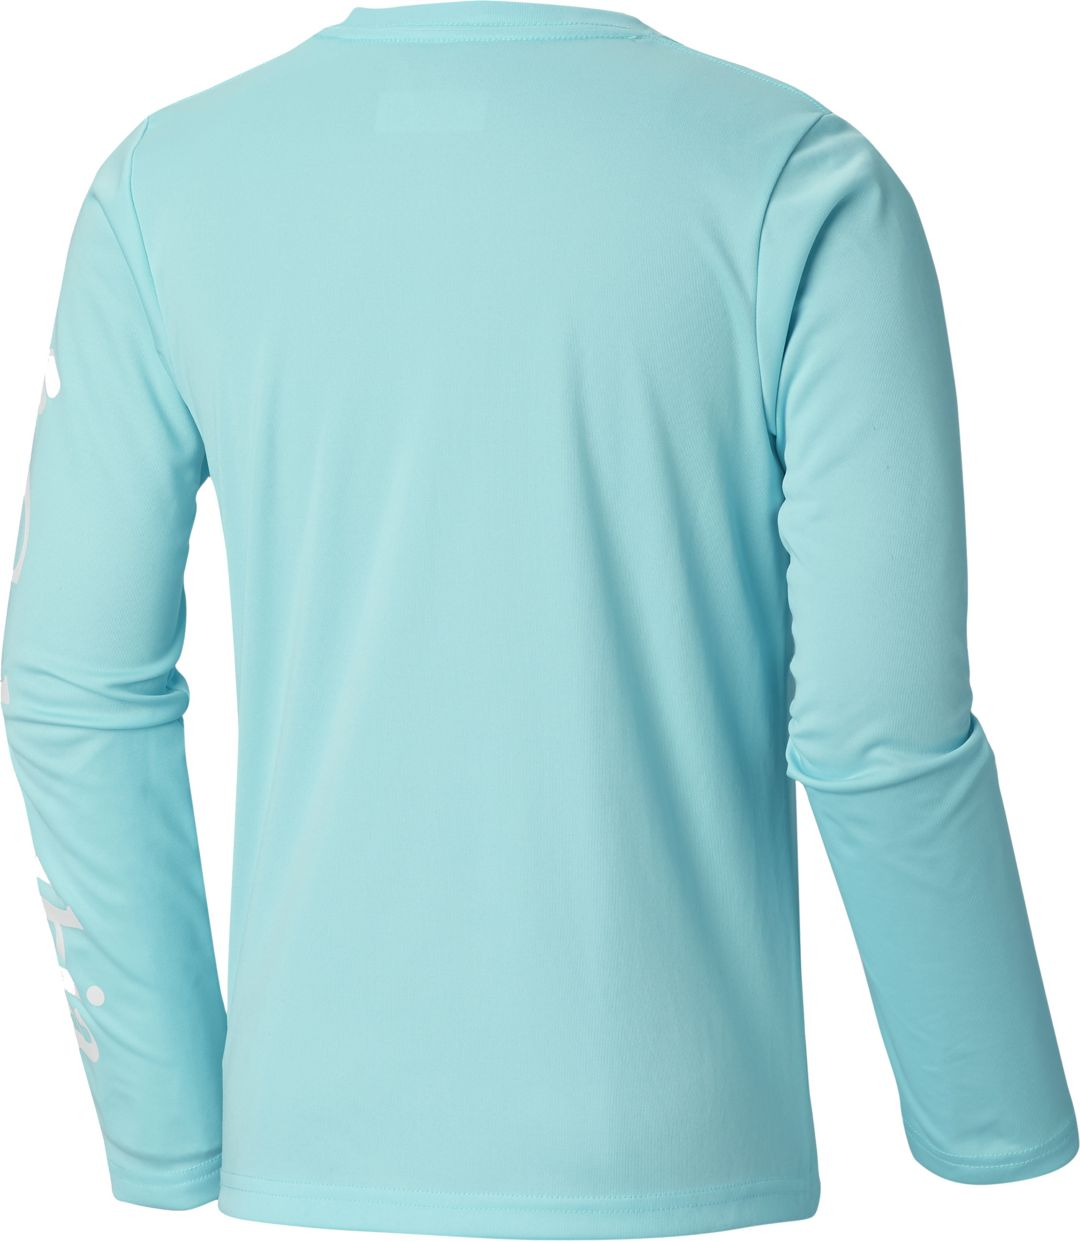 af719335 Columbia Youth PFG Terminal Tackle Long Sleeve Shirt | DICK'S ...